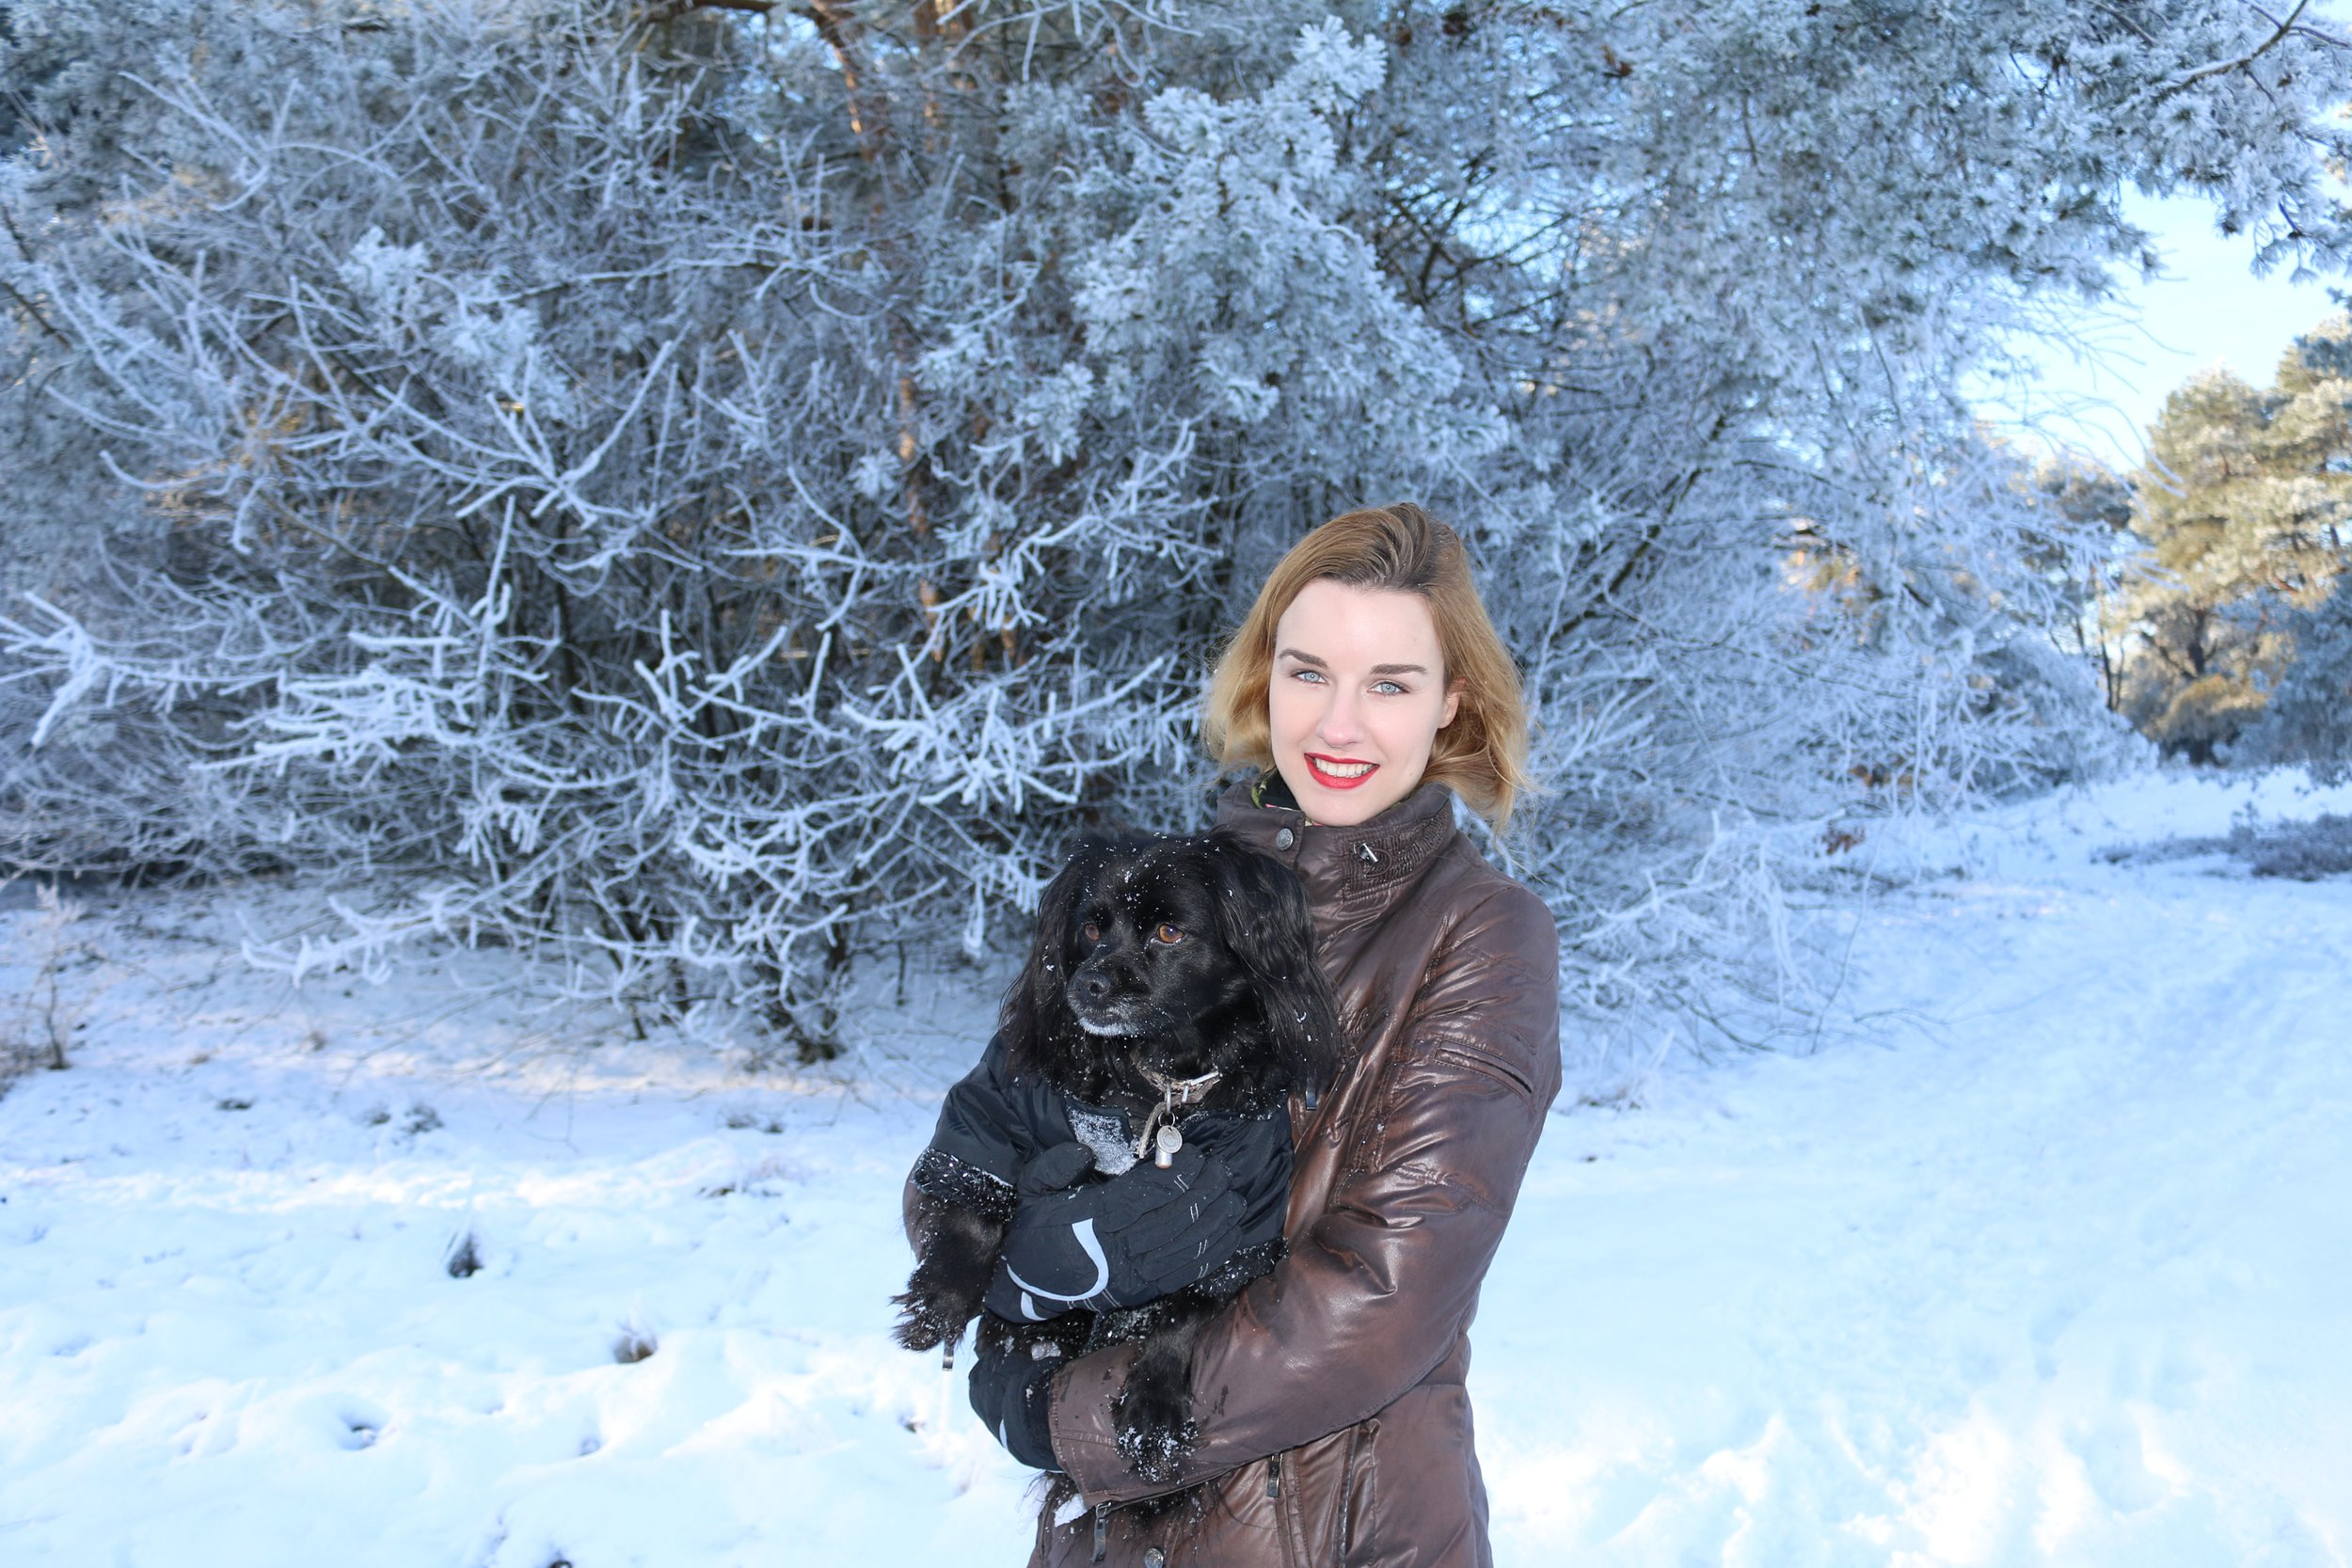 Ivana Raymonda van der Veen and Sophie / January 19th, 2017